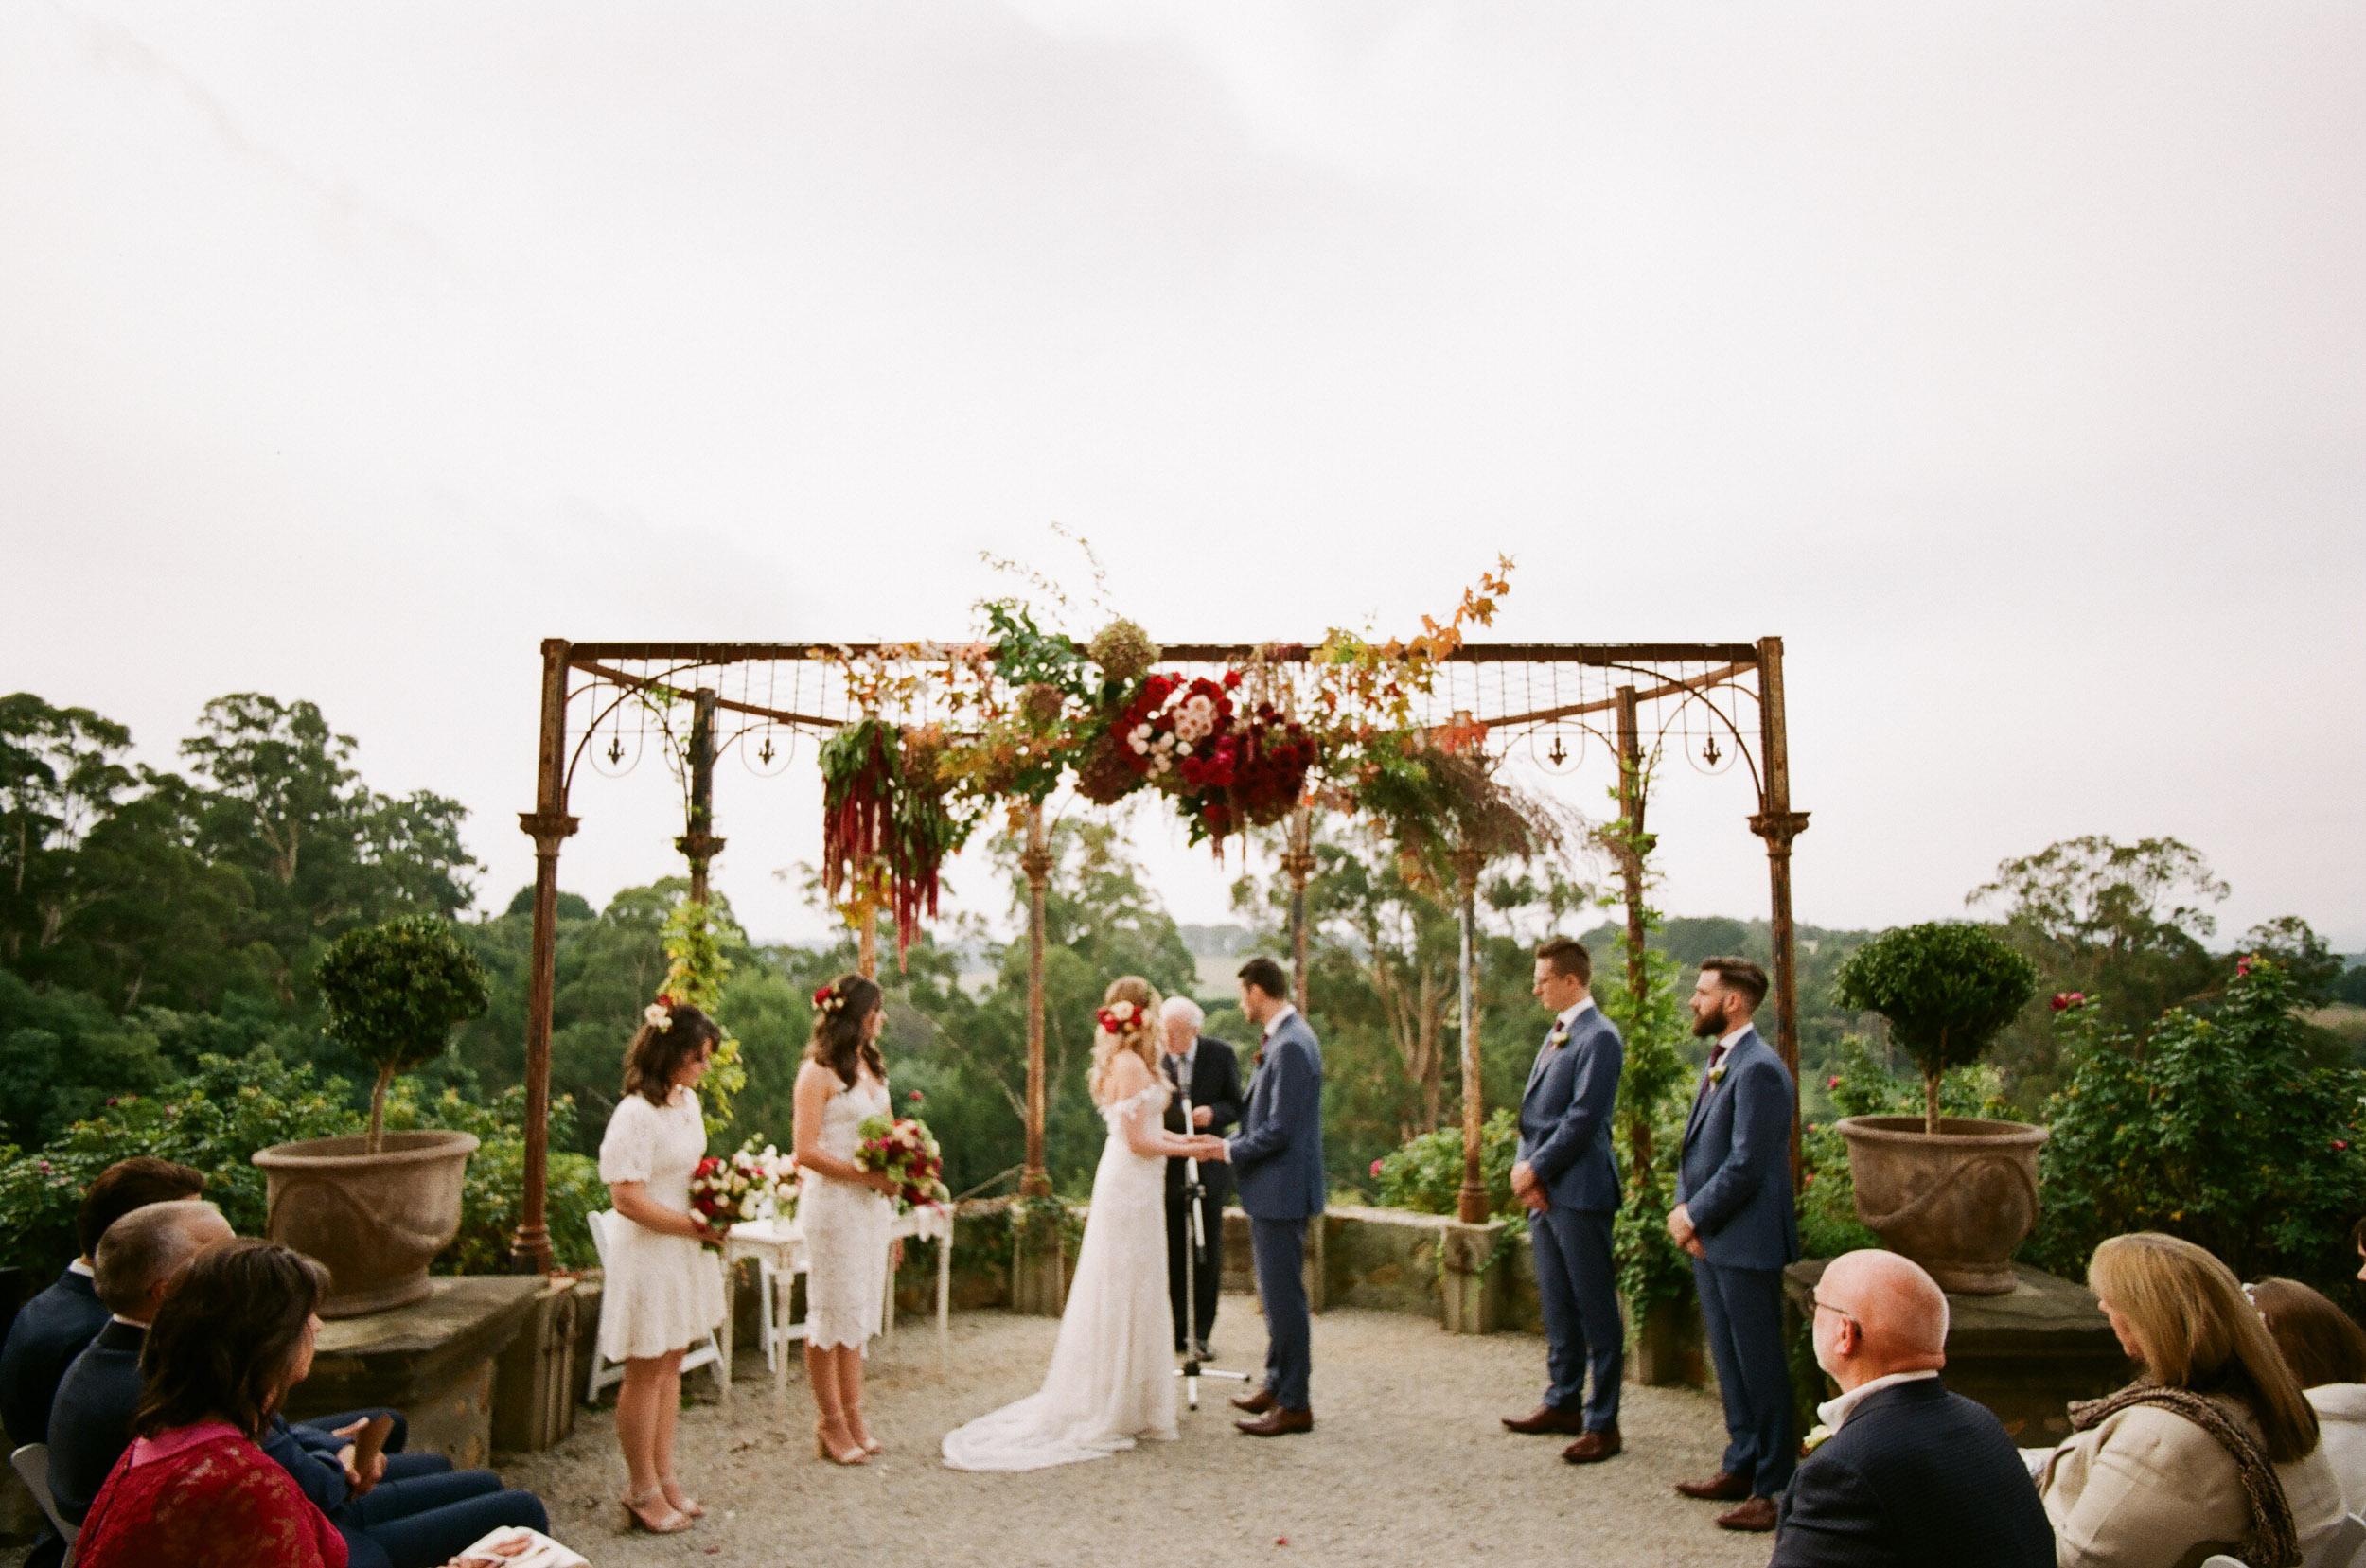 wedding (8 of 24) - 000053030024.jpg